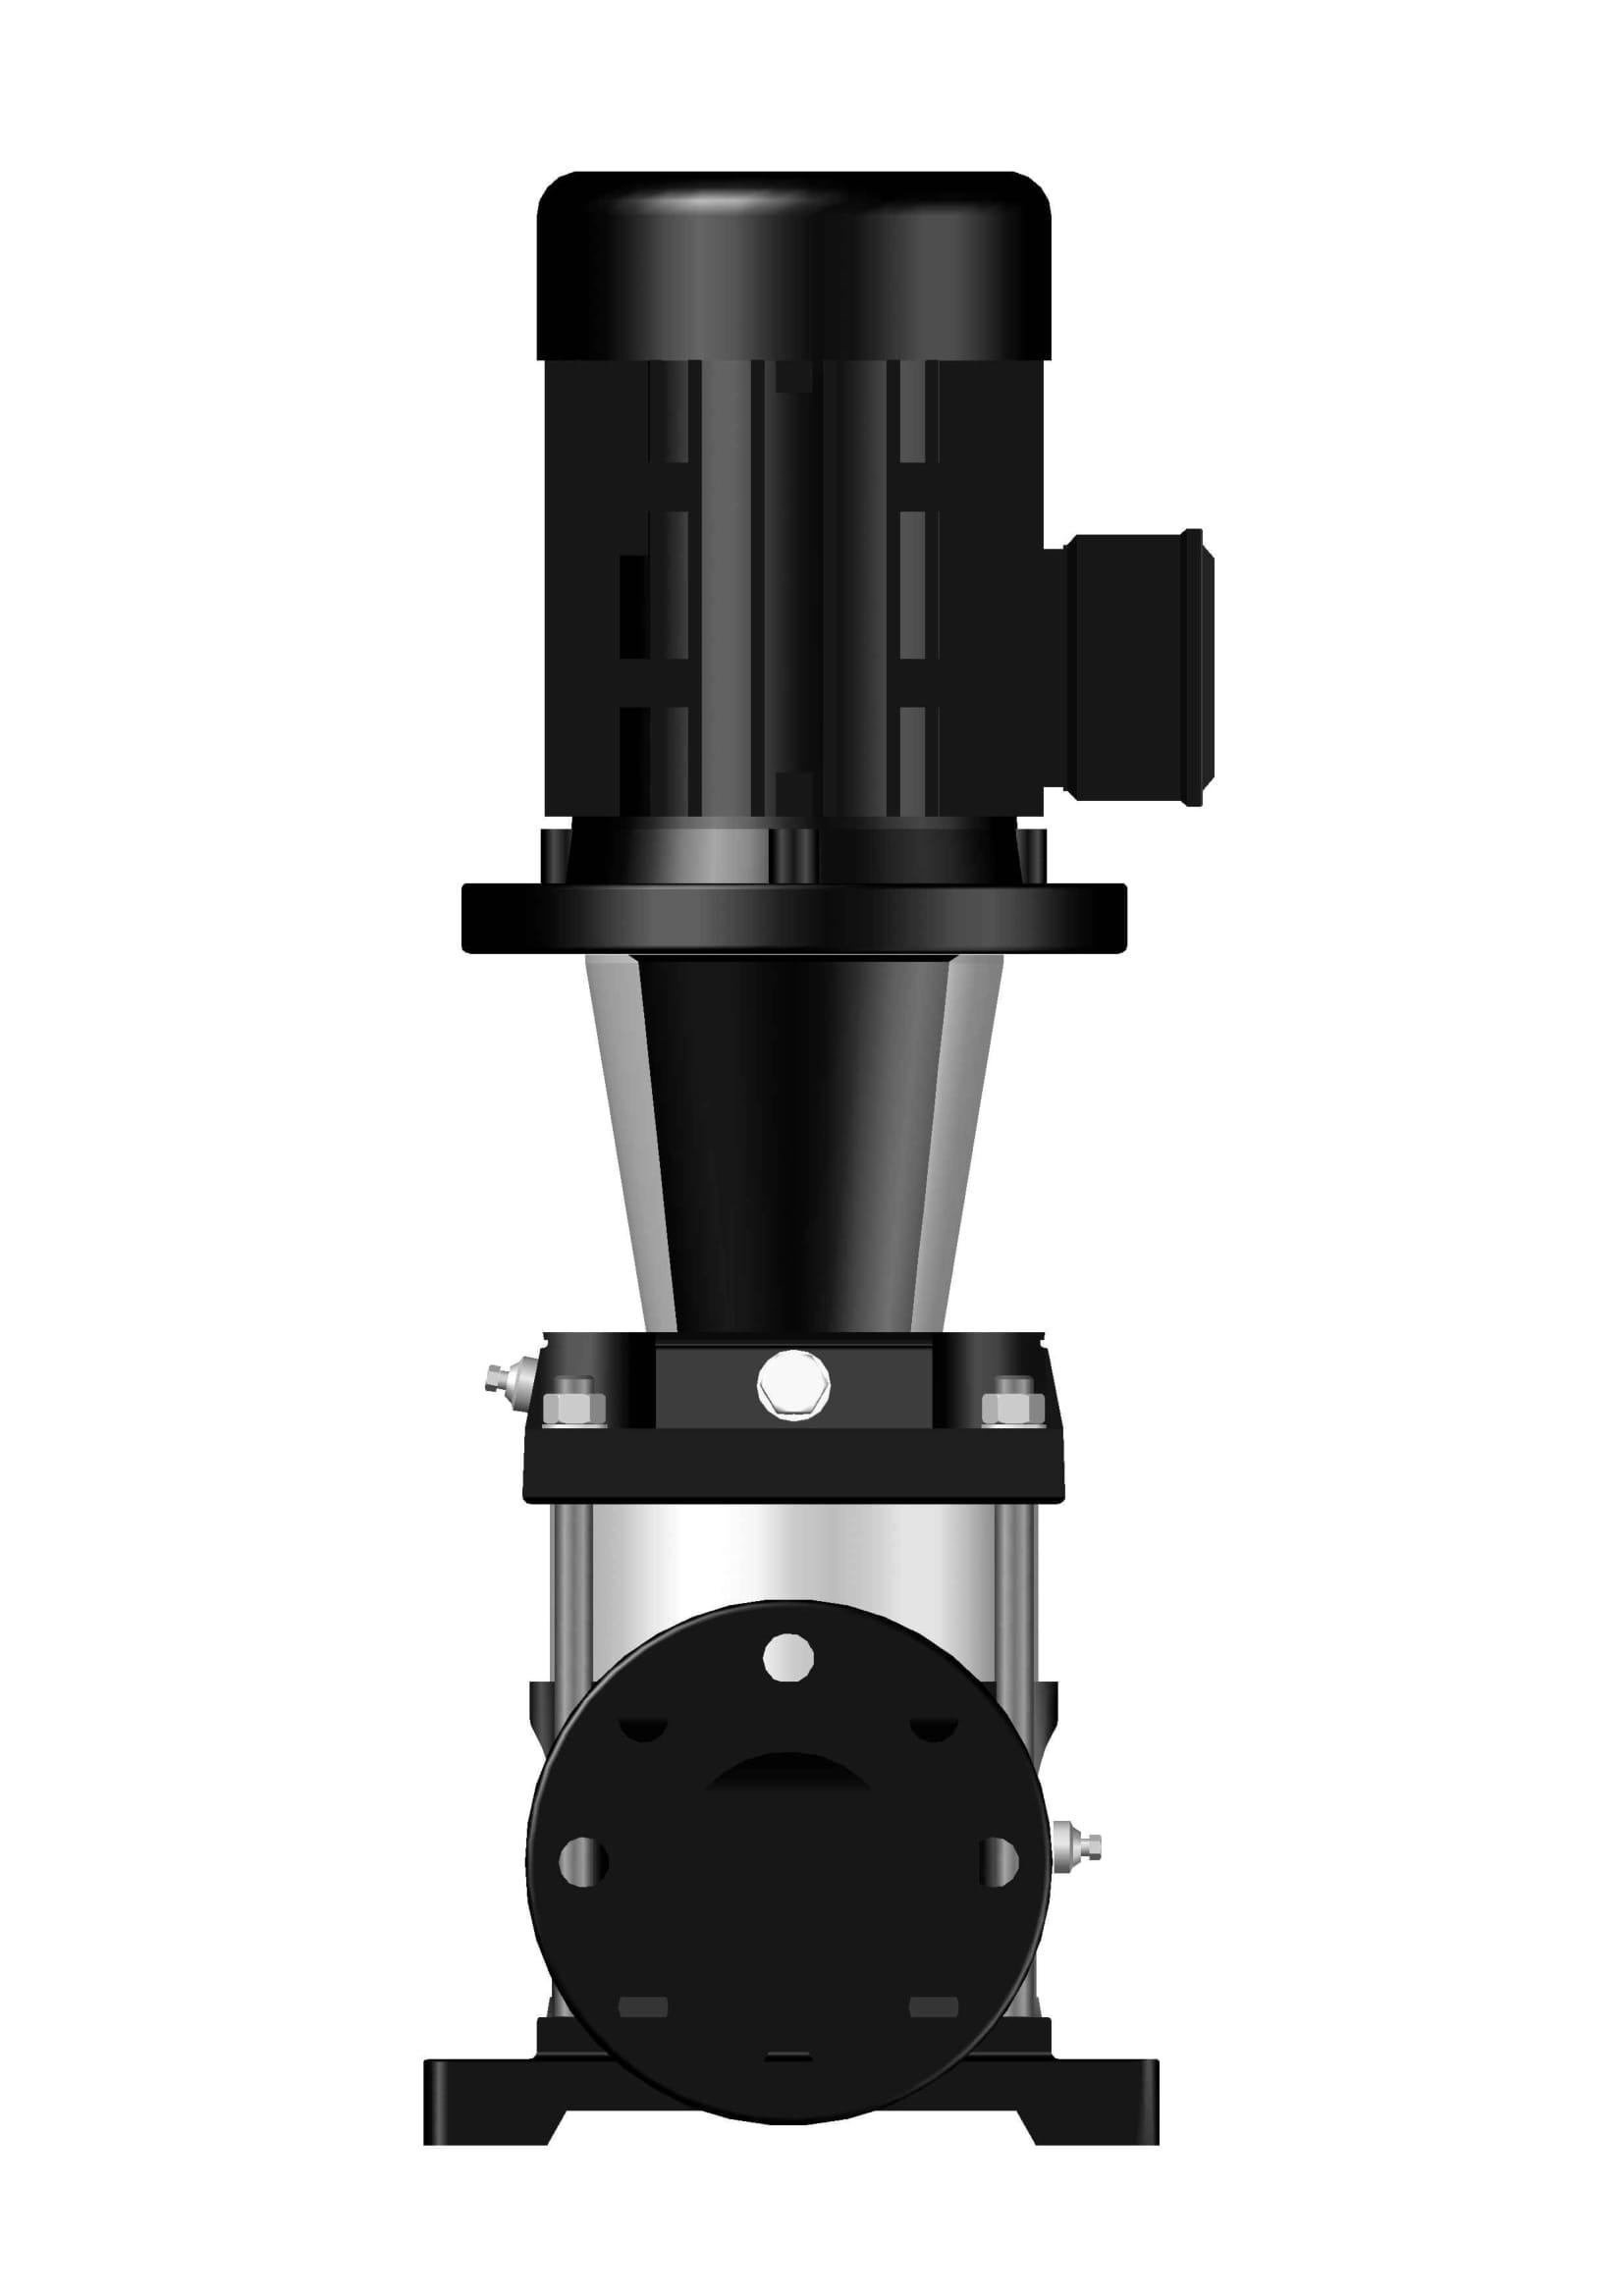 BV 64-01-01